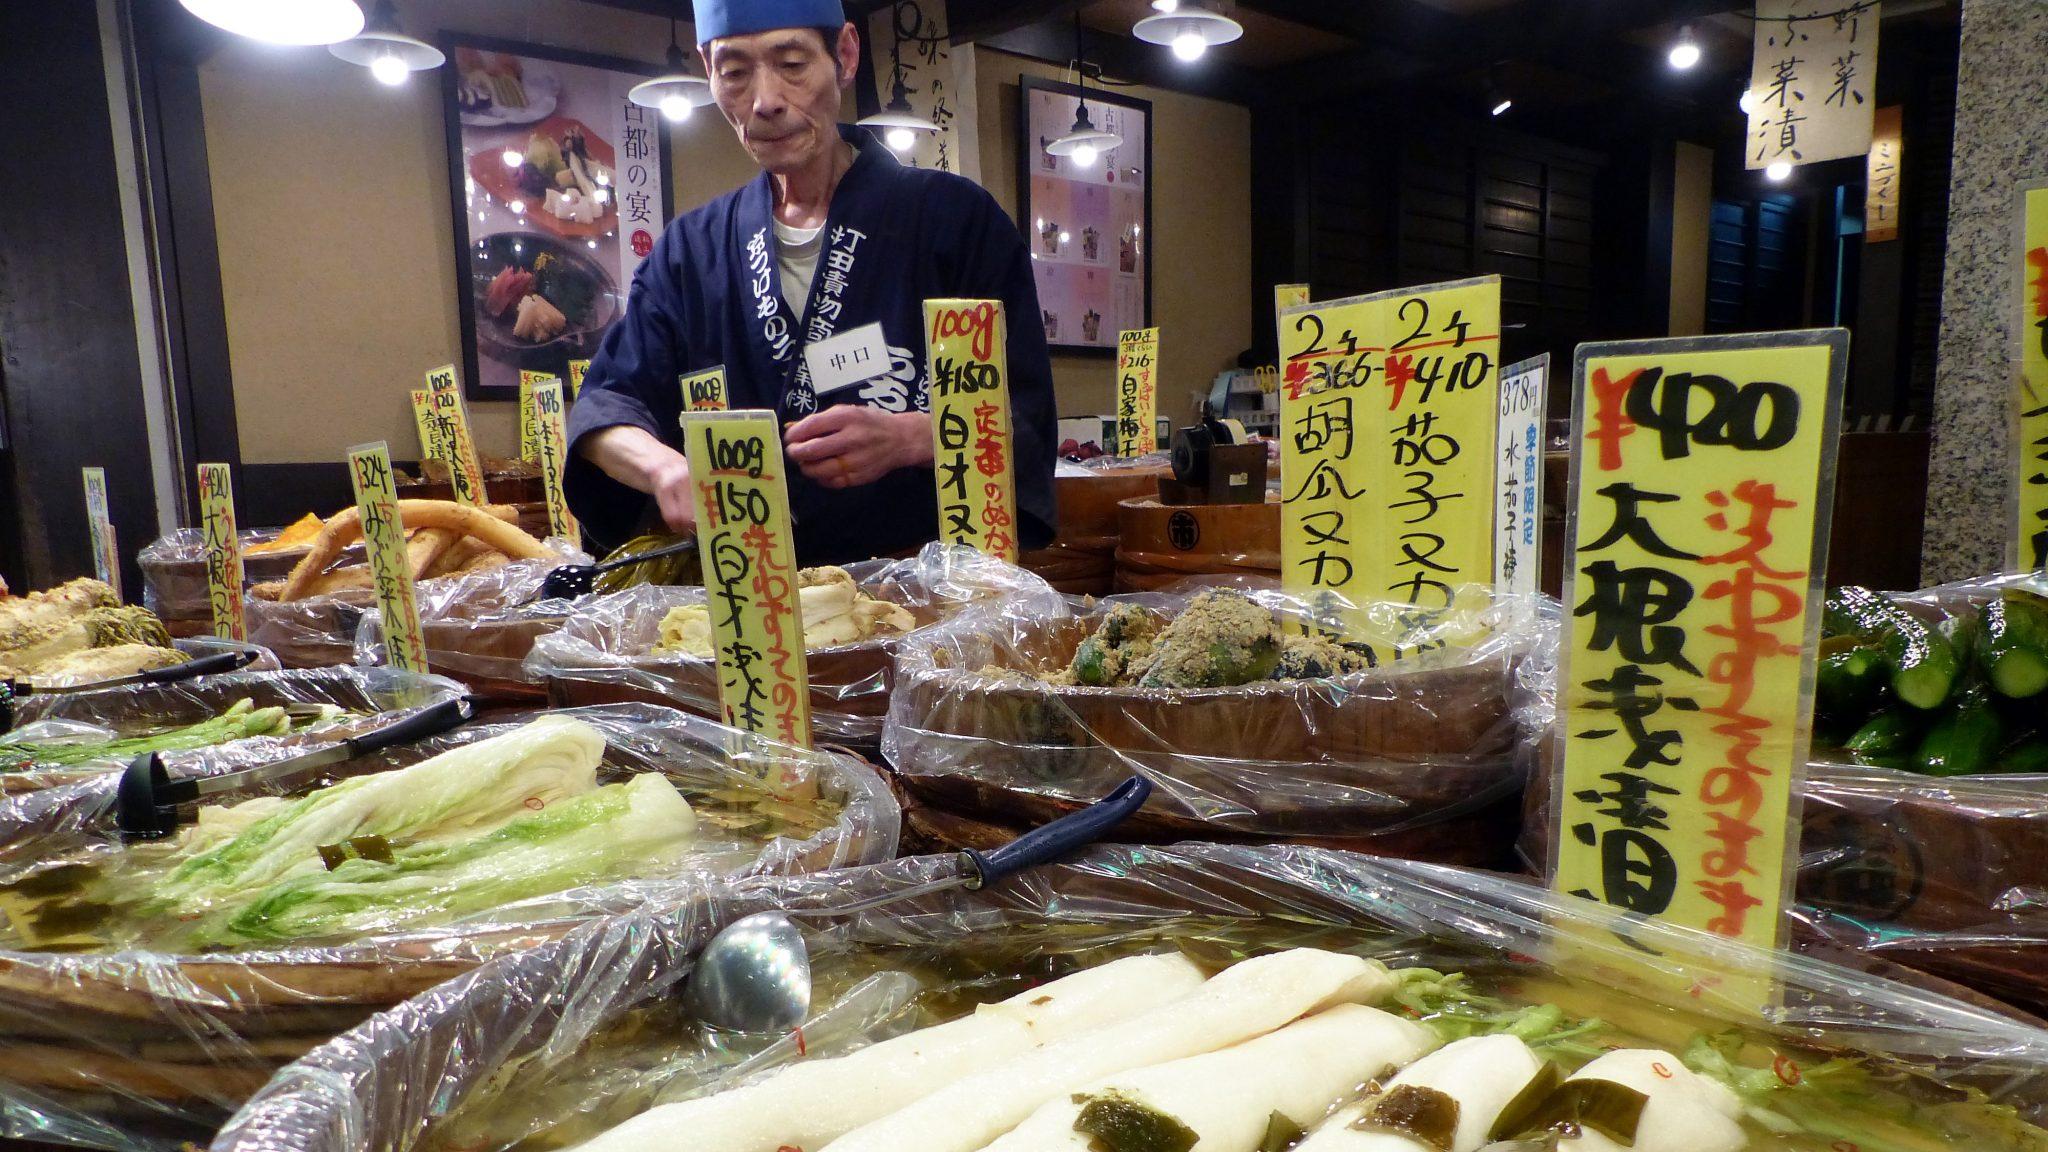 Markt in Japan